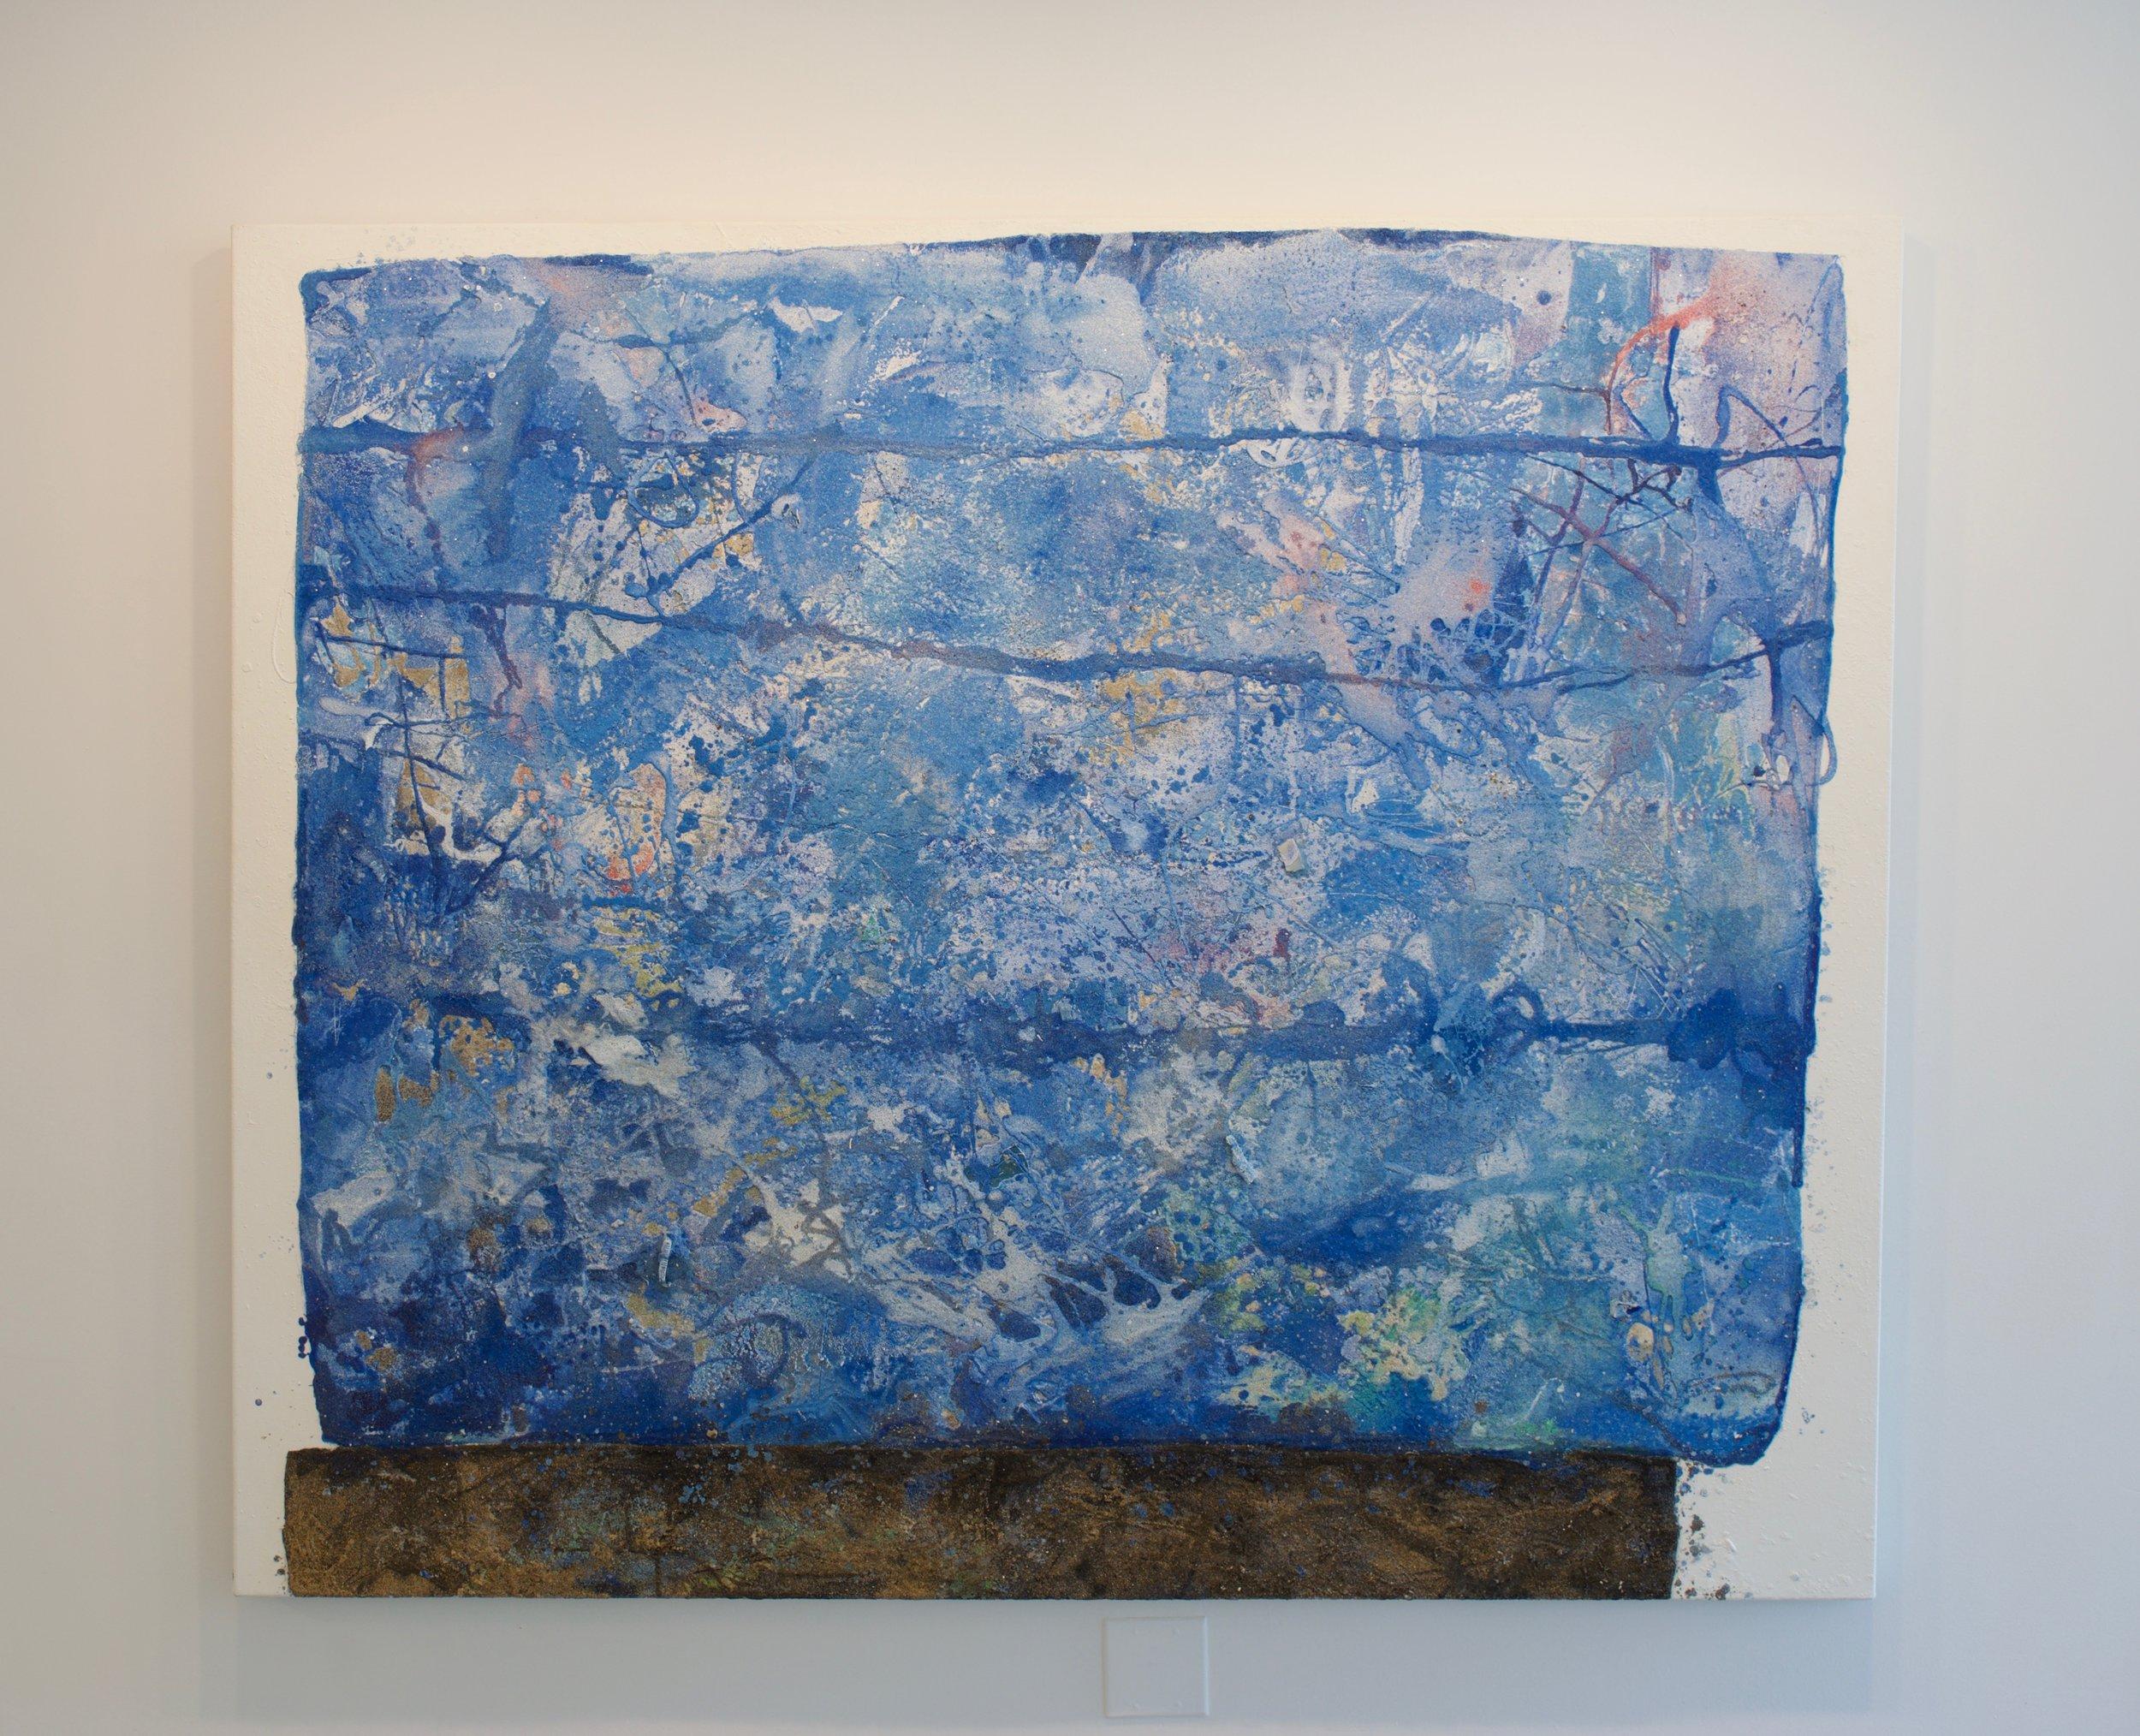 Mark Van Wagner, Blue Drifter, 2016. Sand debris polymers gesso on canvas, 60x72 in.